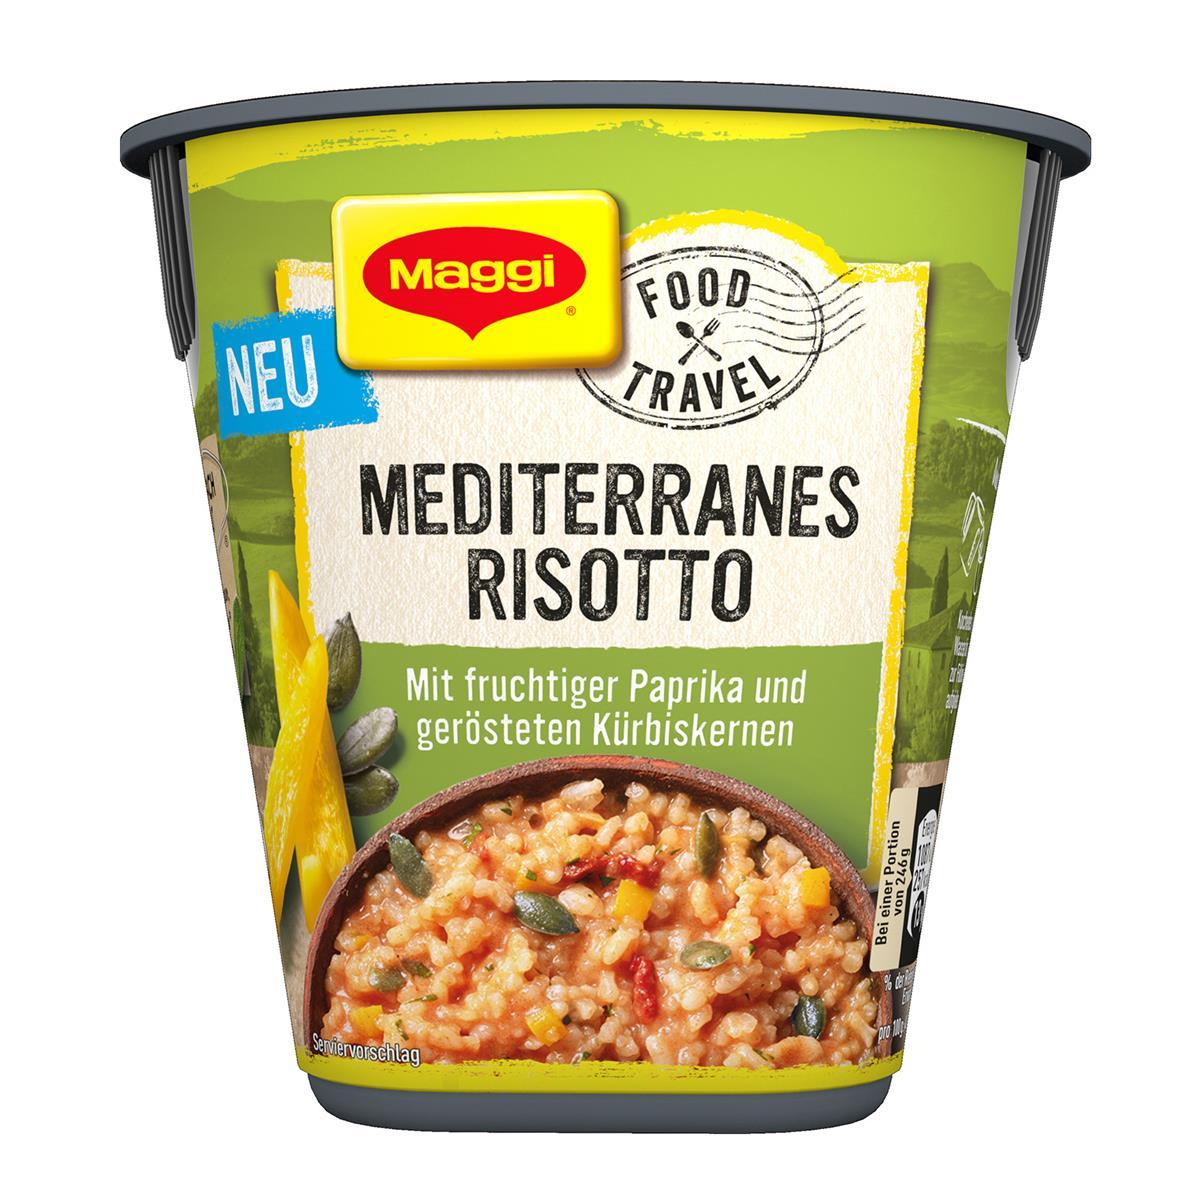 Hauptnahrungsmittel der mediterranen Diätkarte